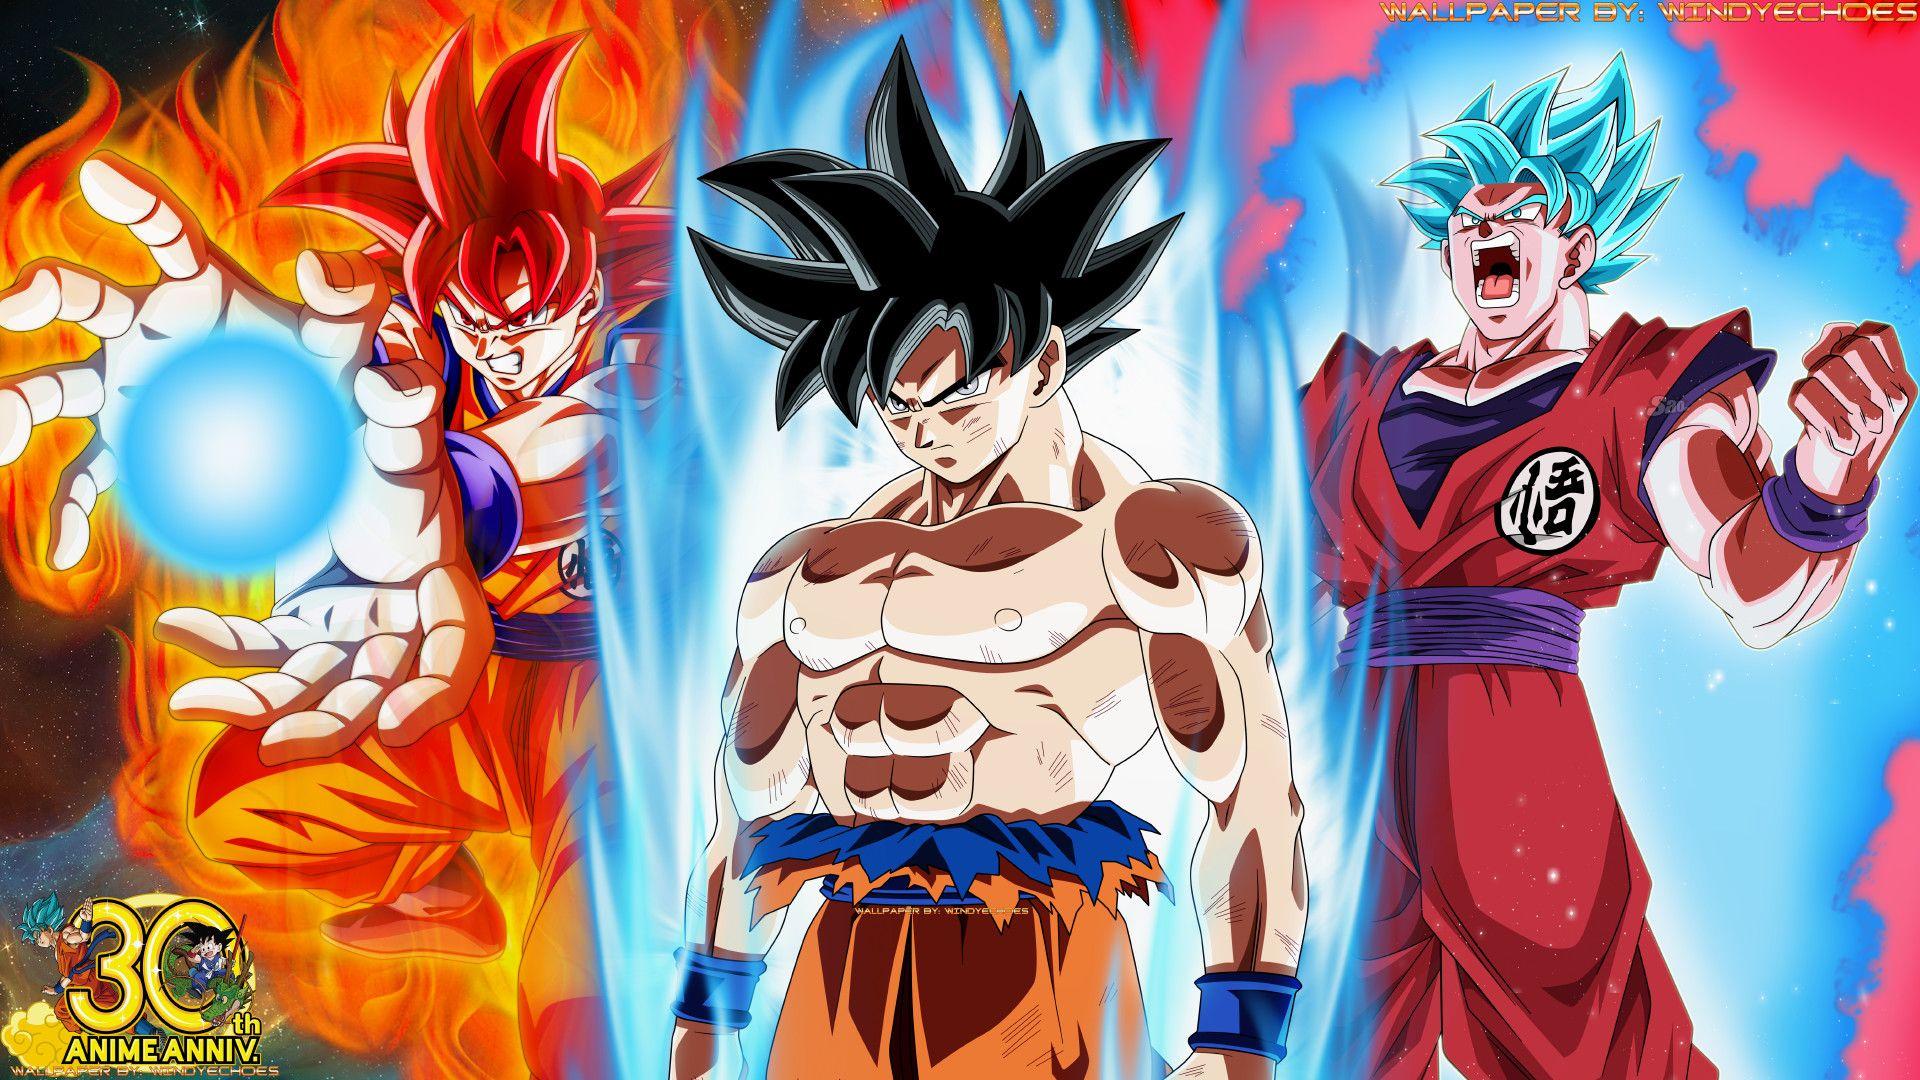 Best Of 1080p Goku Super Saiyan God Wallpaper Hd Photos